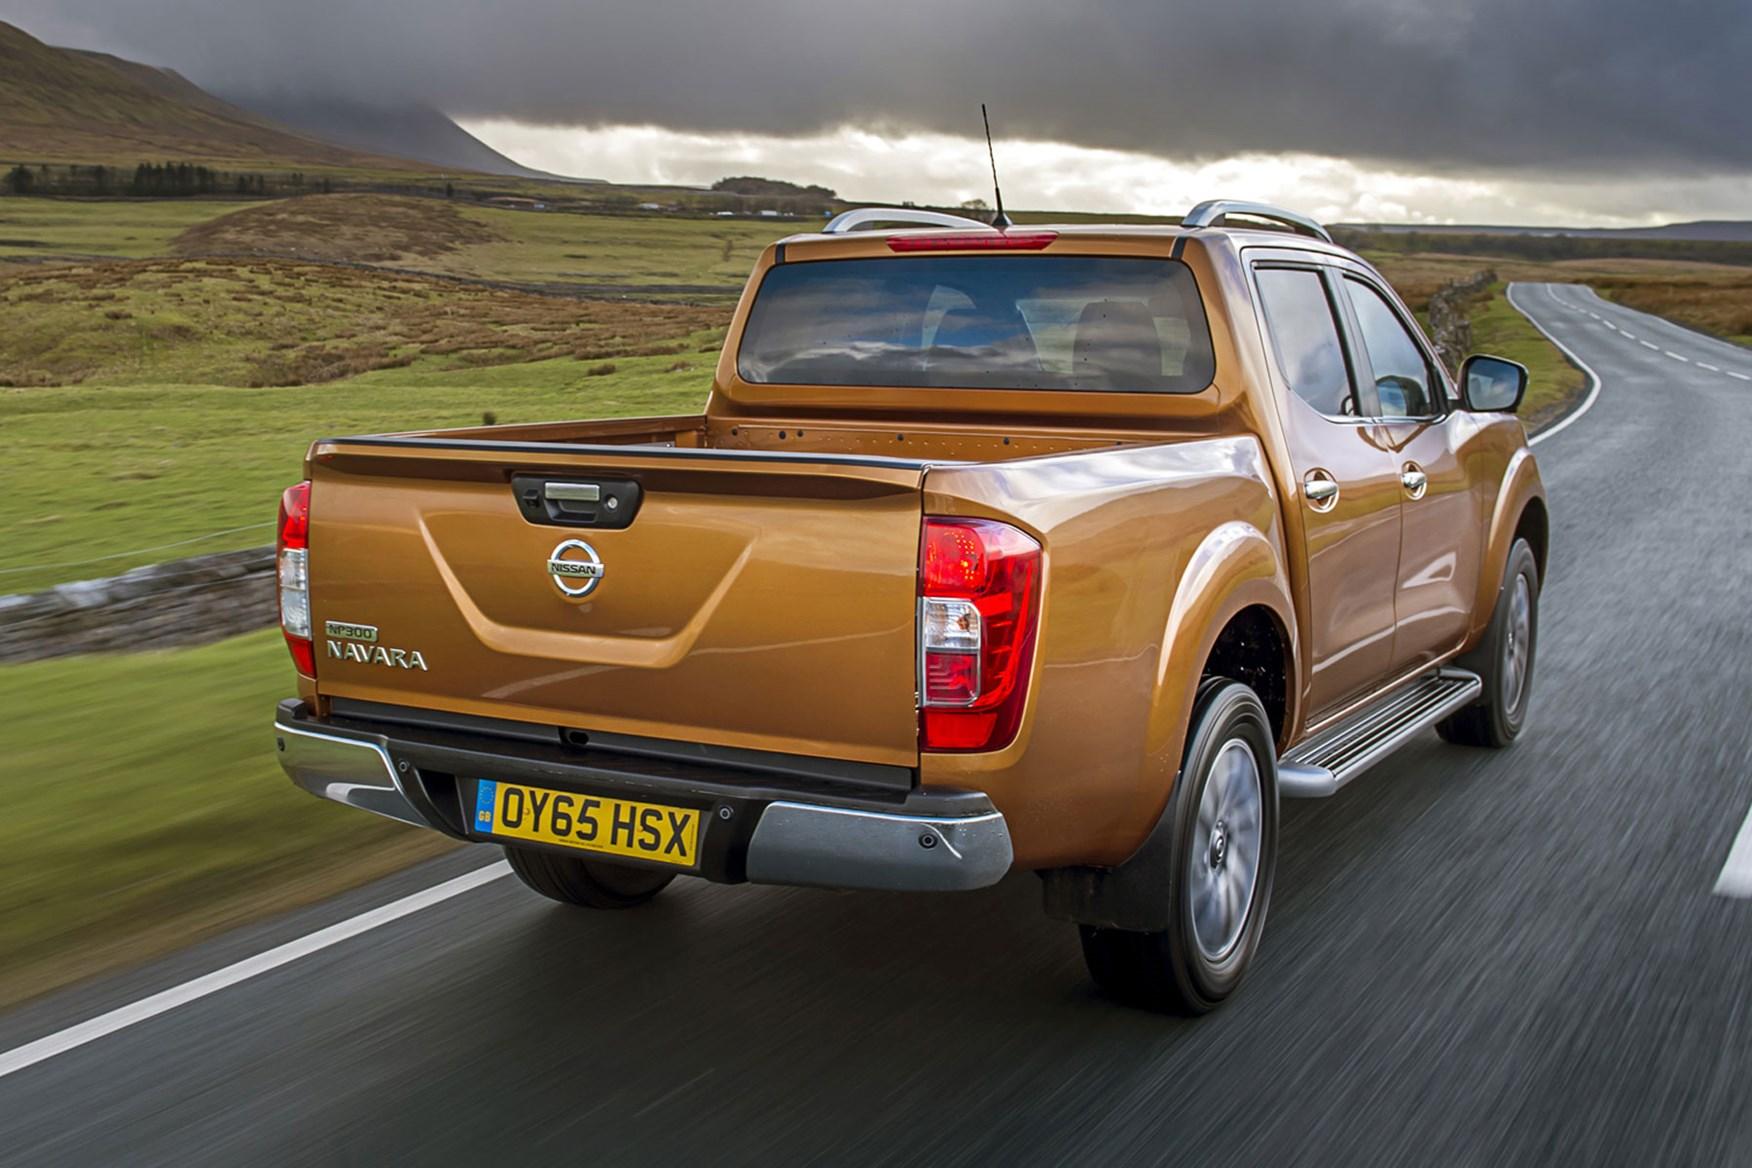 Nissan Navara review - rear view, driving, orange